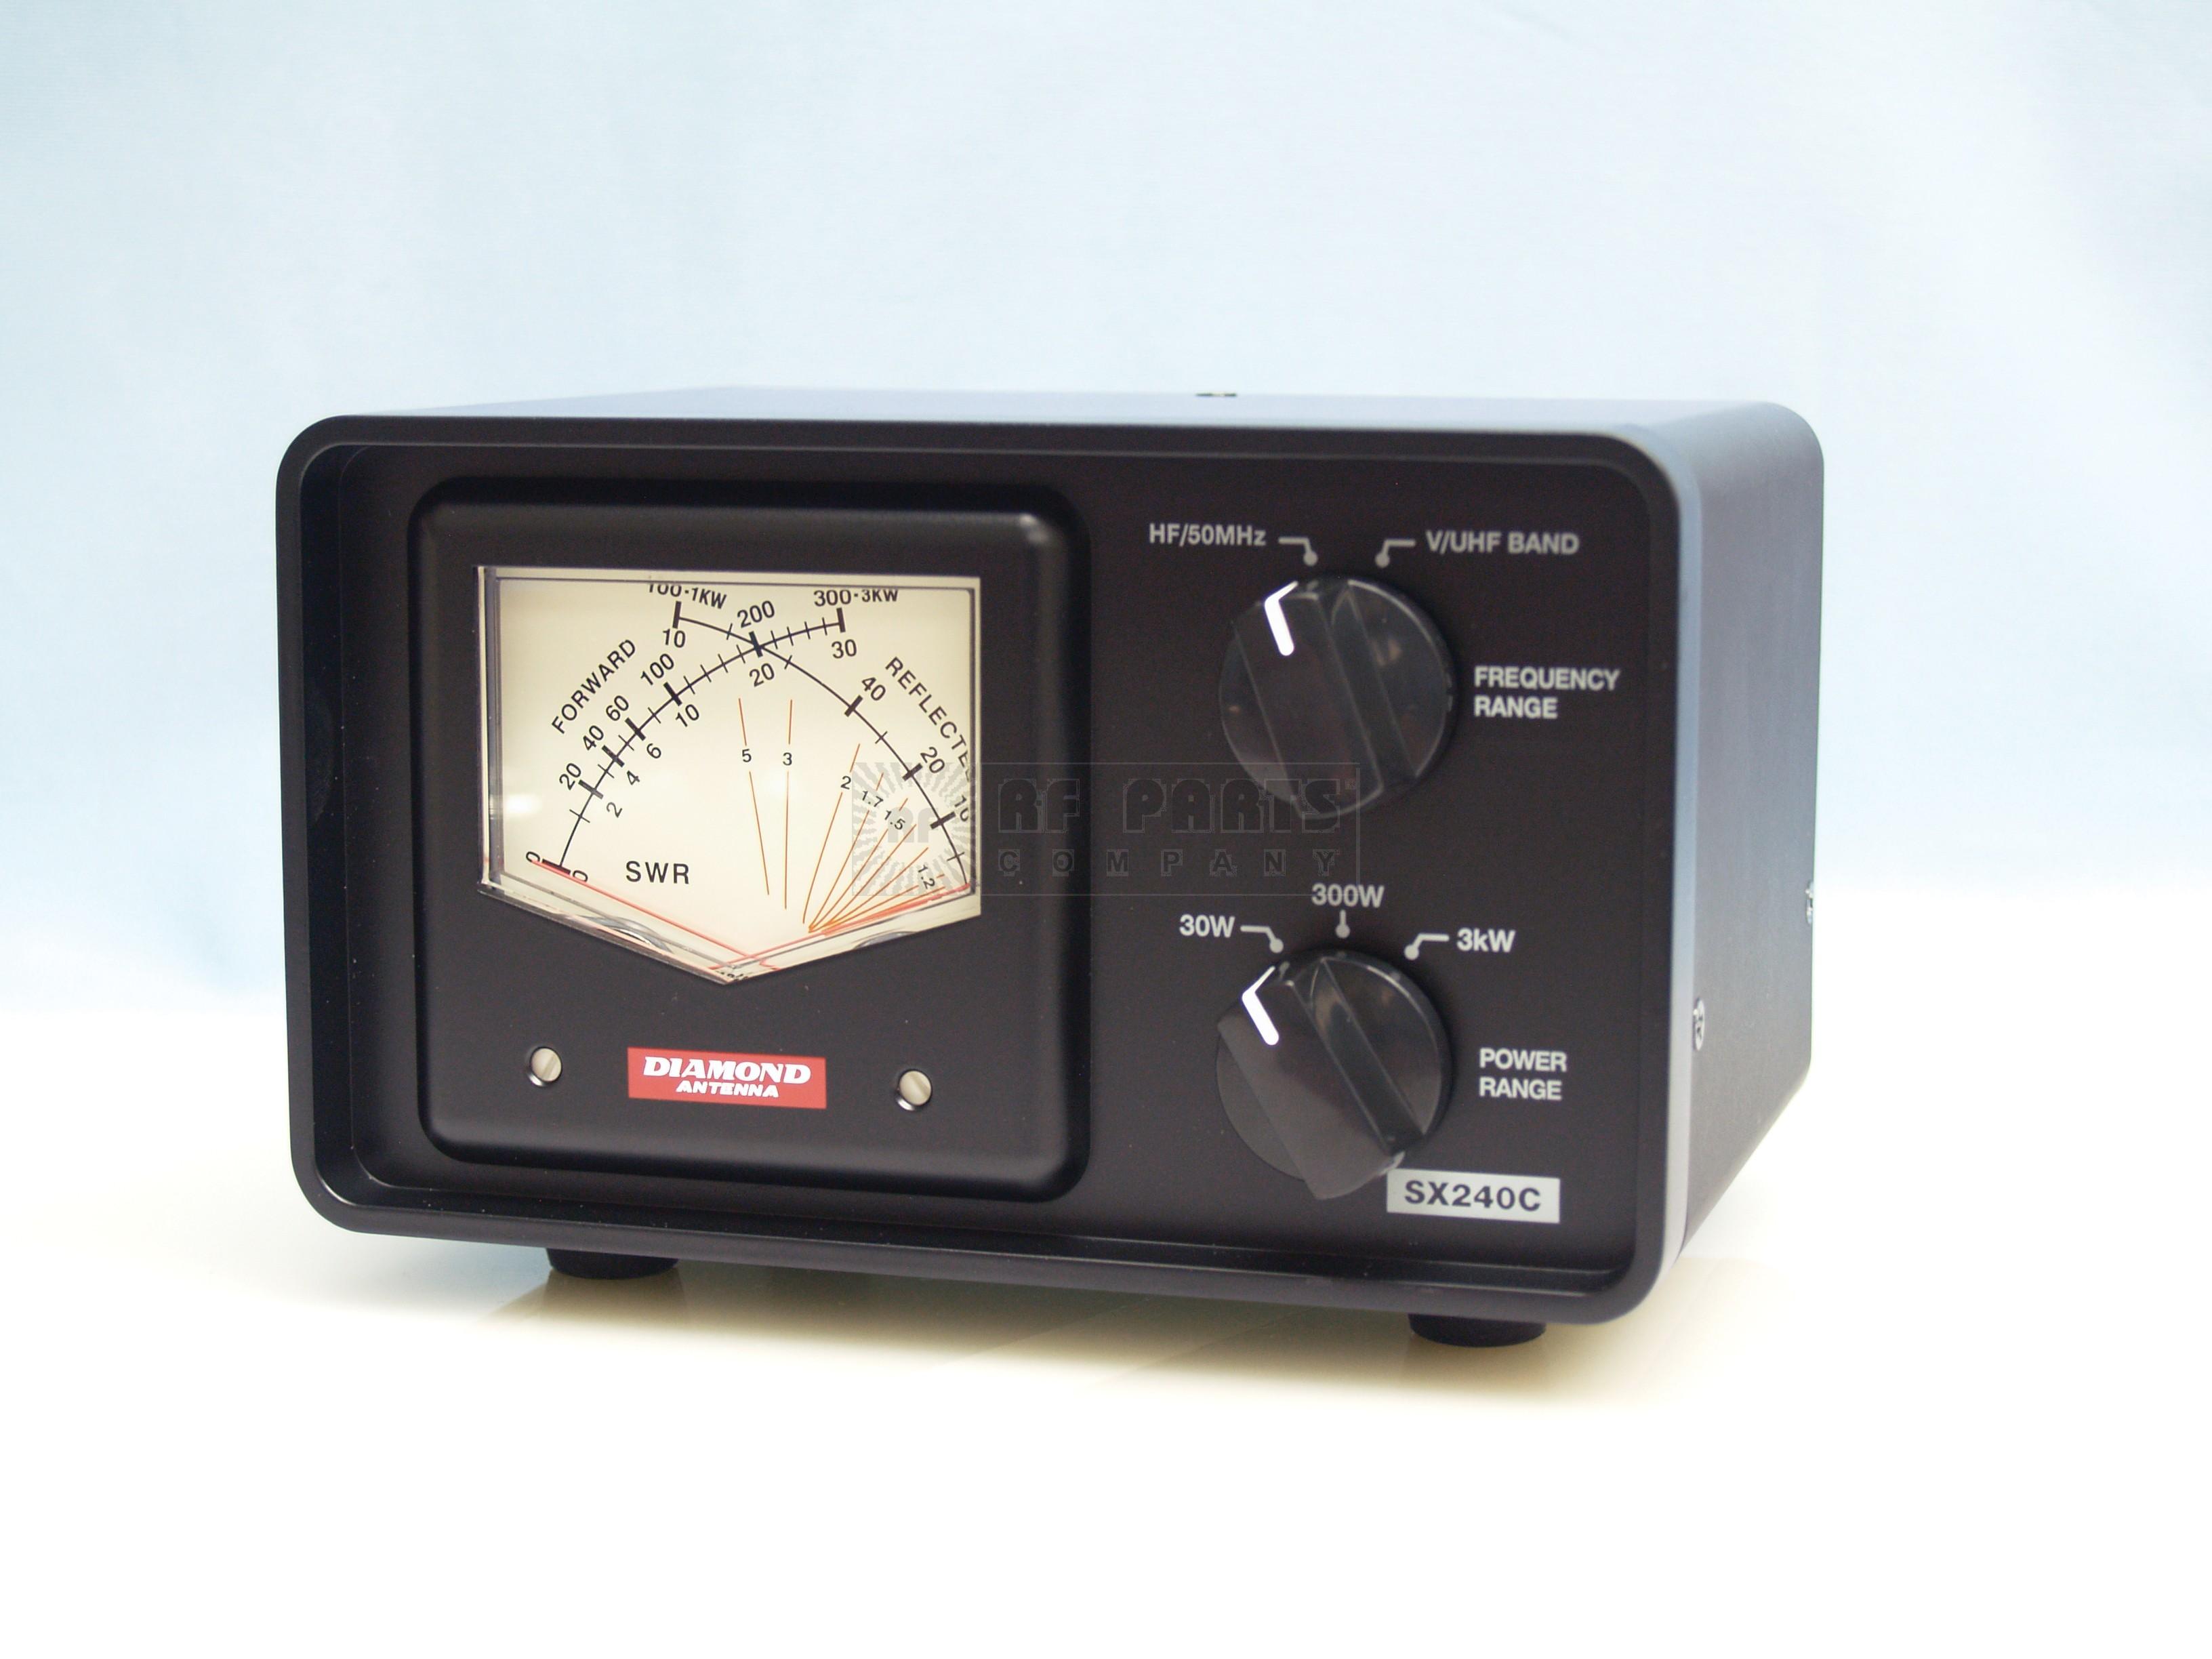 SX240C Wattmeter, cross needle, 1.8-54mhz 140-470mhz, 30/300/3kw power, DIAMOND